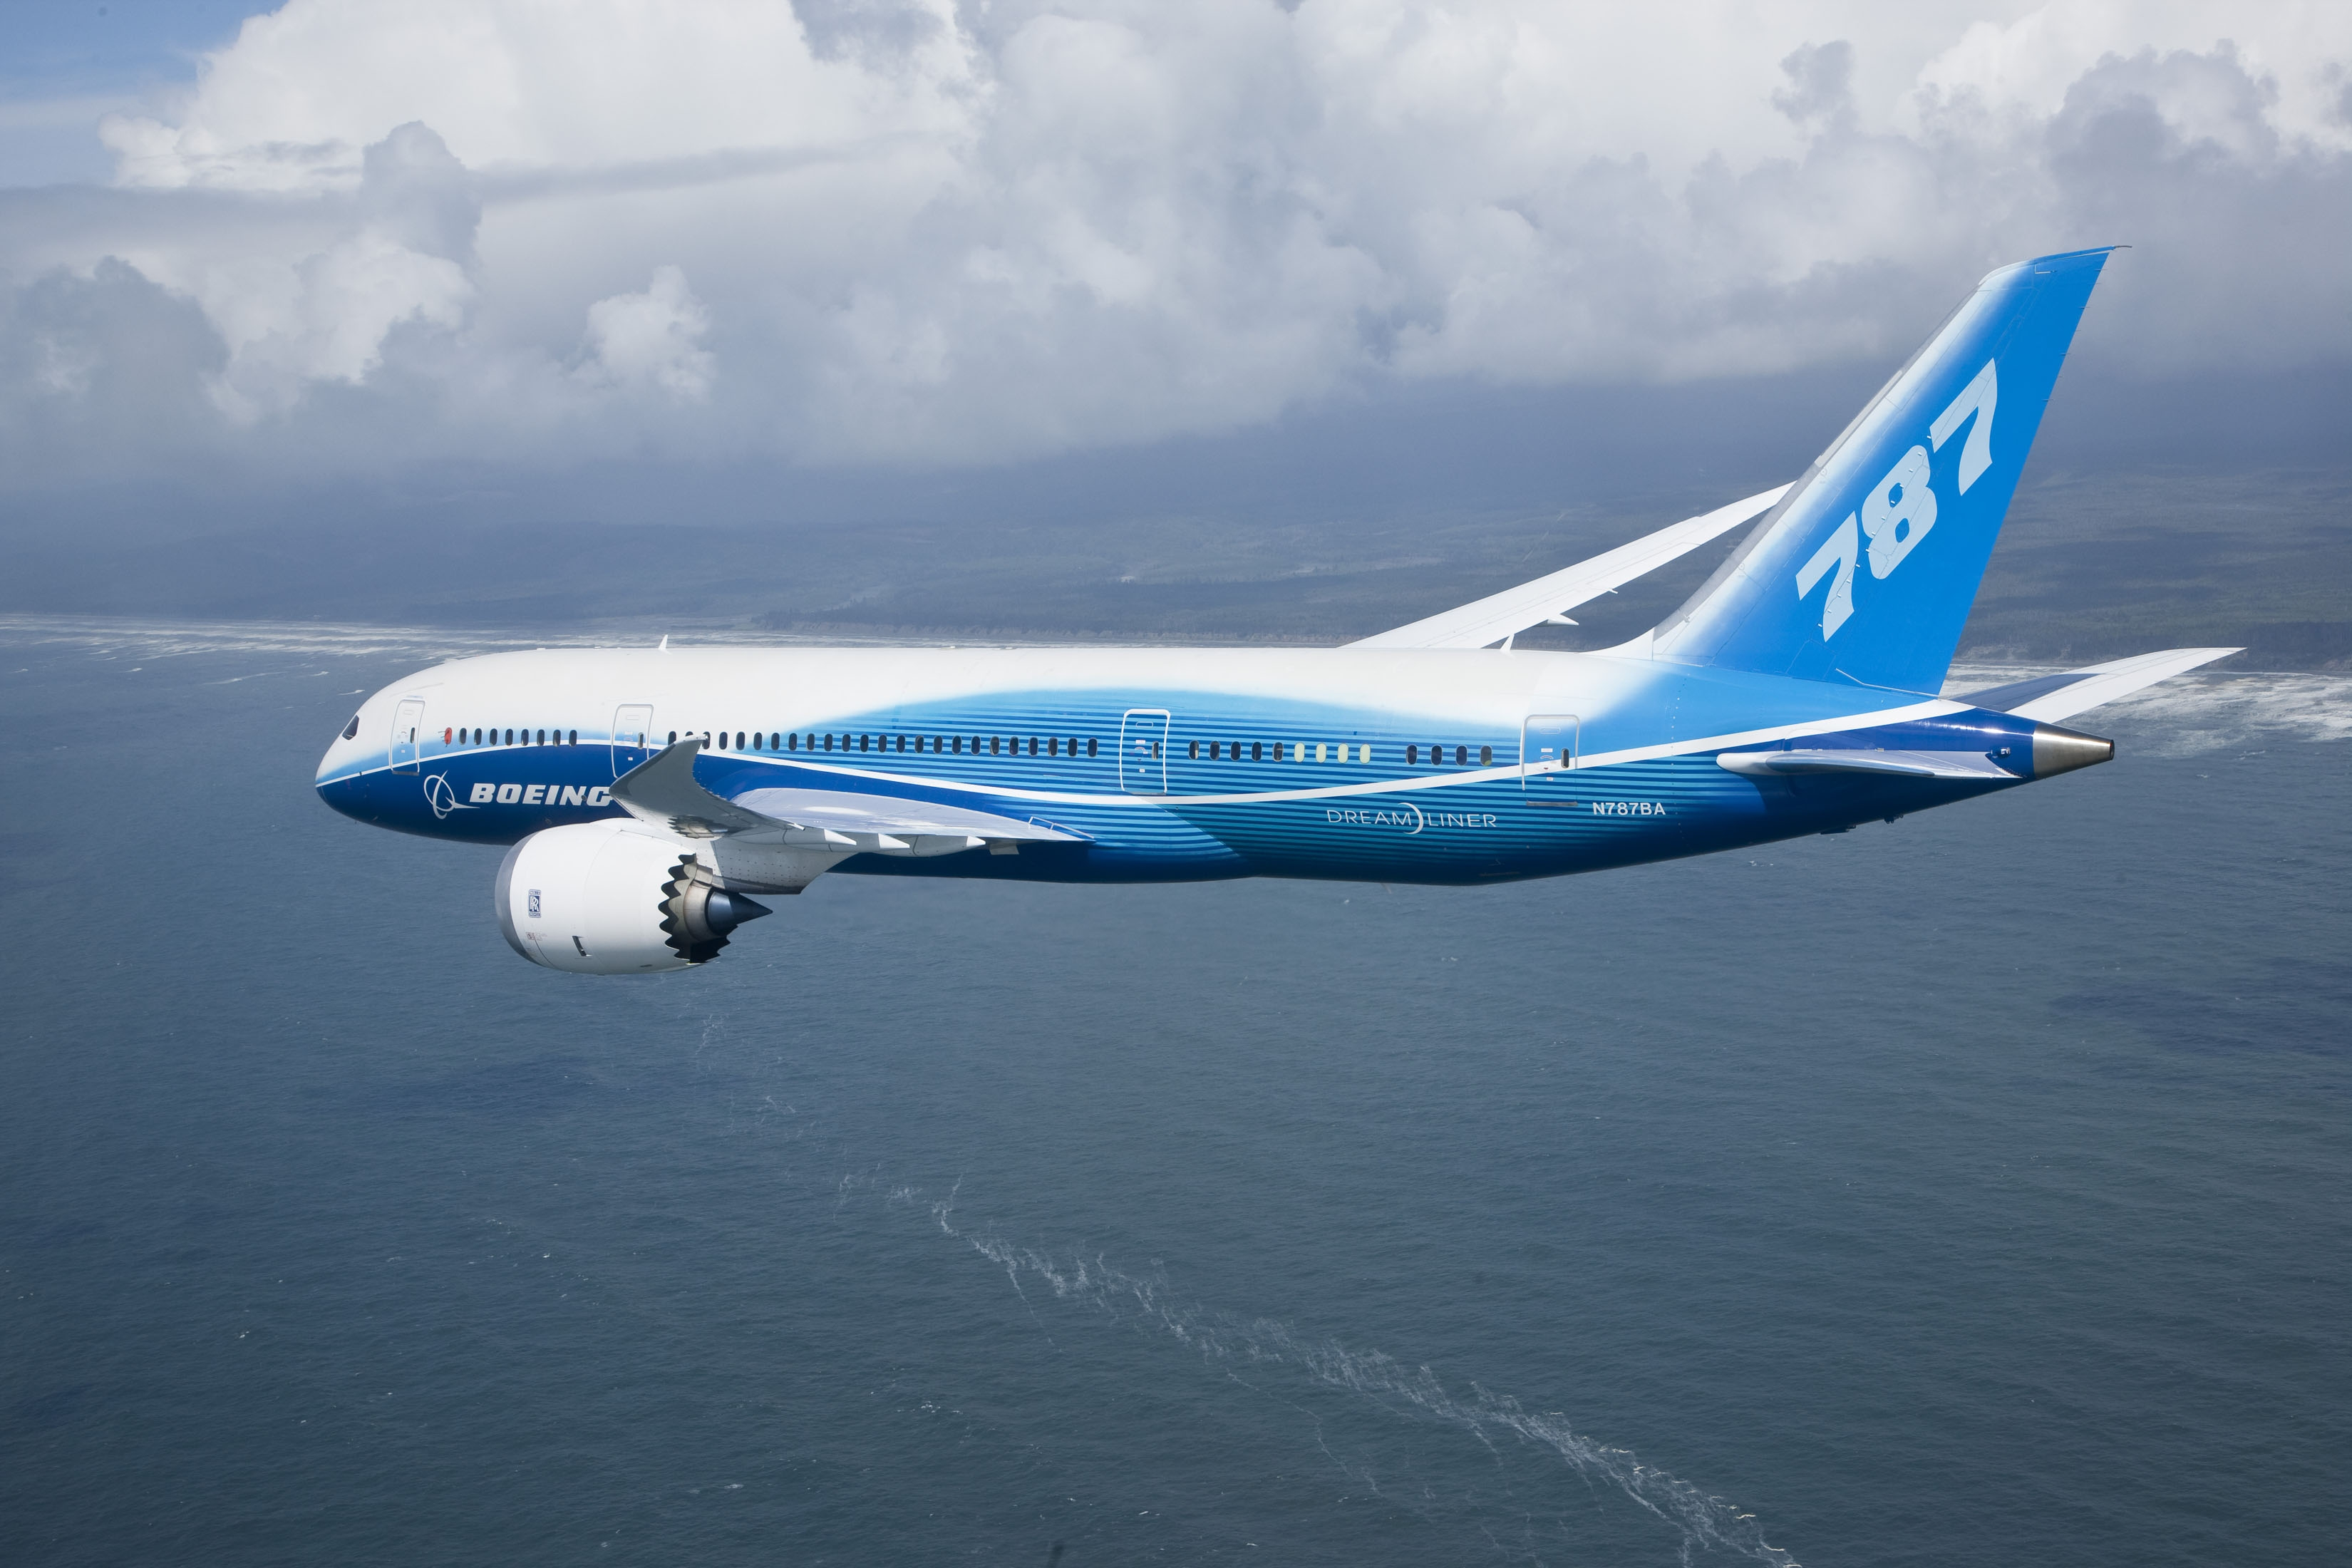 Boeing-ը 12 մլրդ դոլարով ավելացնում է սեփական բաժնետոմսերի հետգնման ծավալը